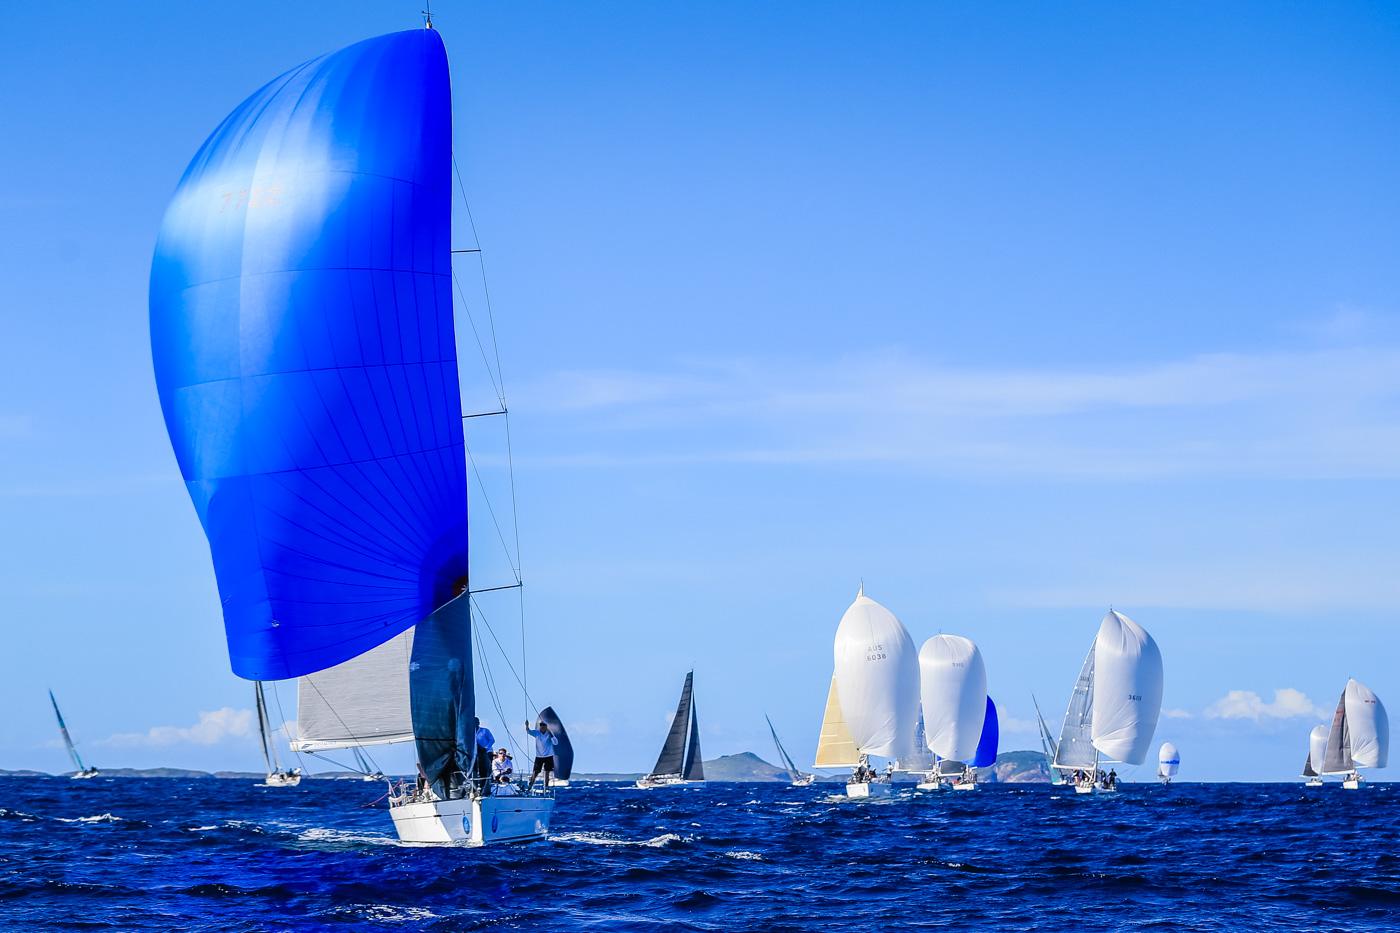 IRC division three fleet let by Justadash. Photo Saltwater Images.